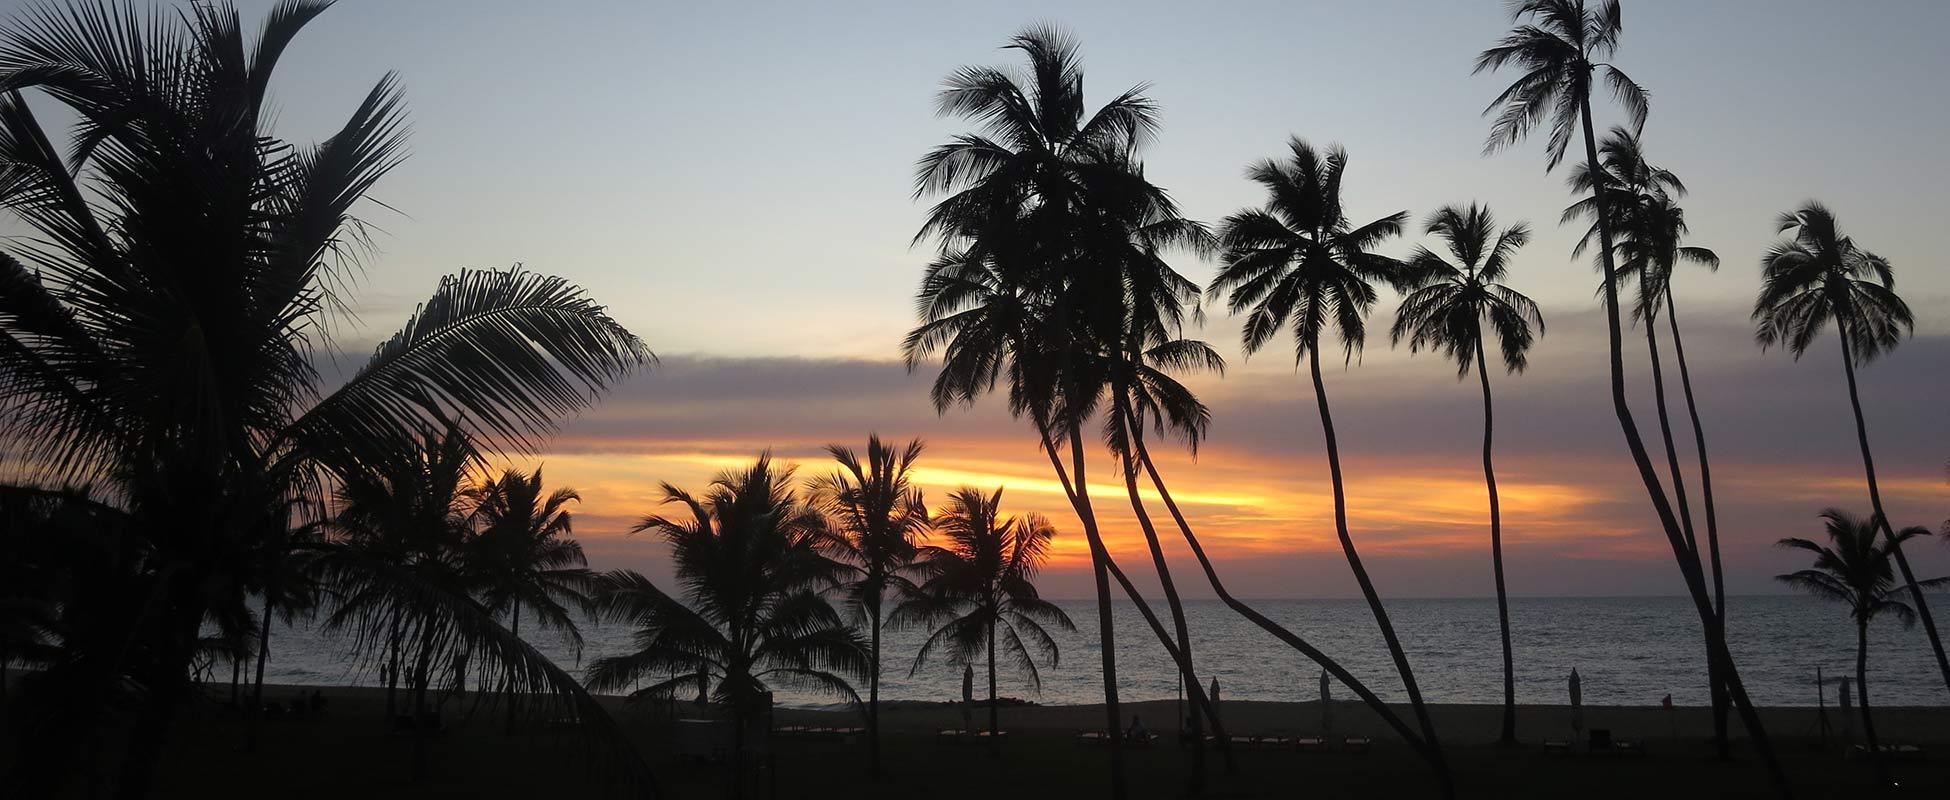 Chilaw Sri Lanka  city pictures gallery : Sri Lanka Chilaw an der Westküste